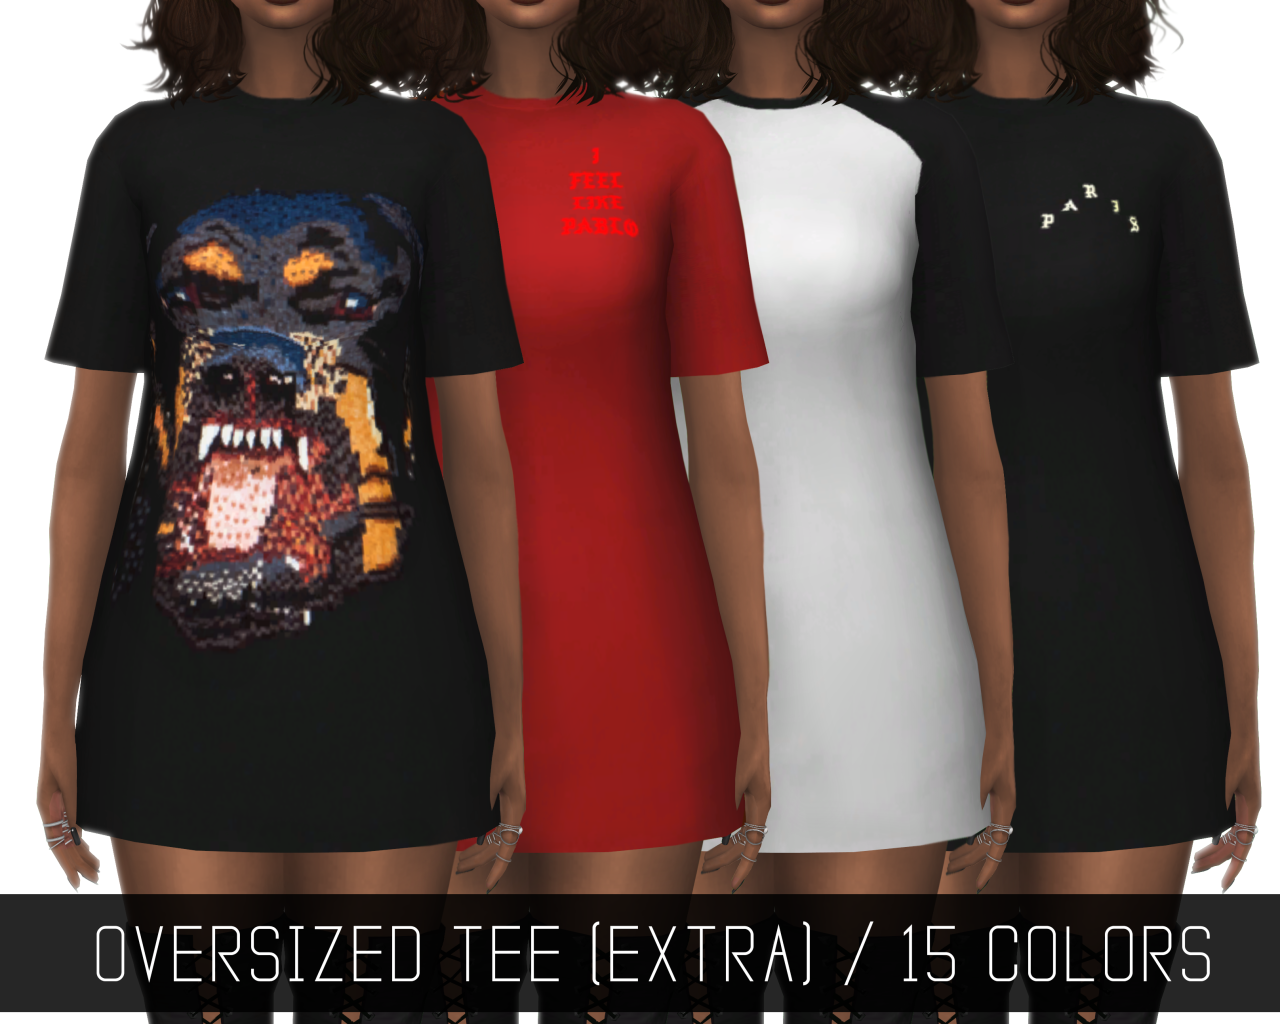 Patternsgivenchy Extra15 Tee• • Plain Colors; Oversized Base25 BxWdoerC